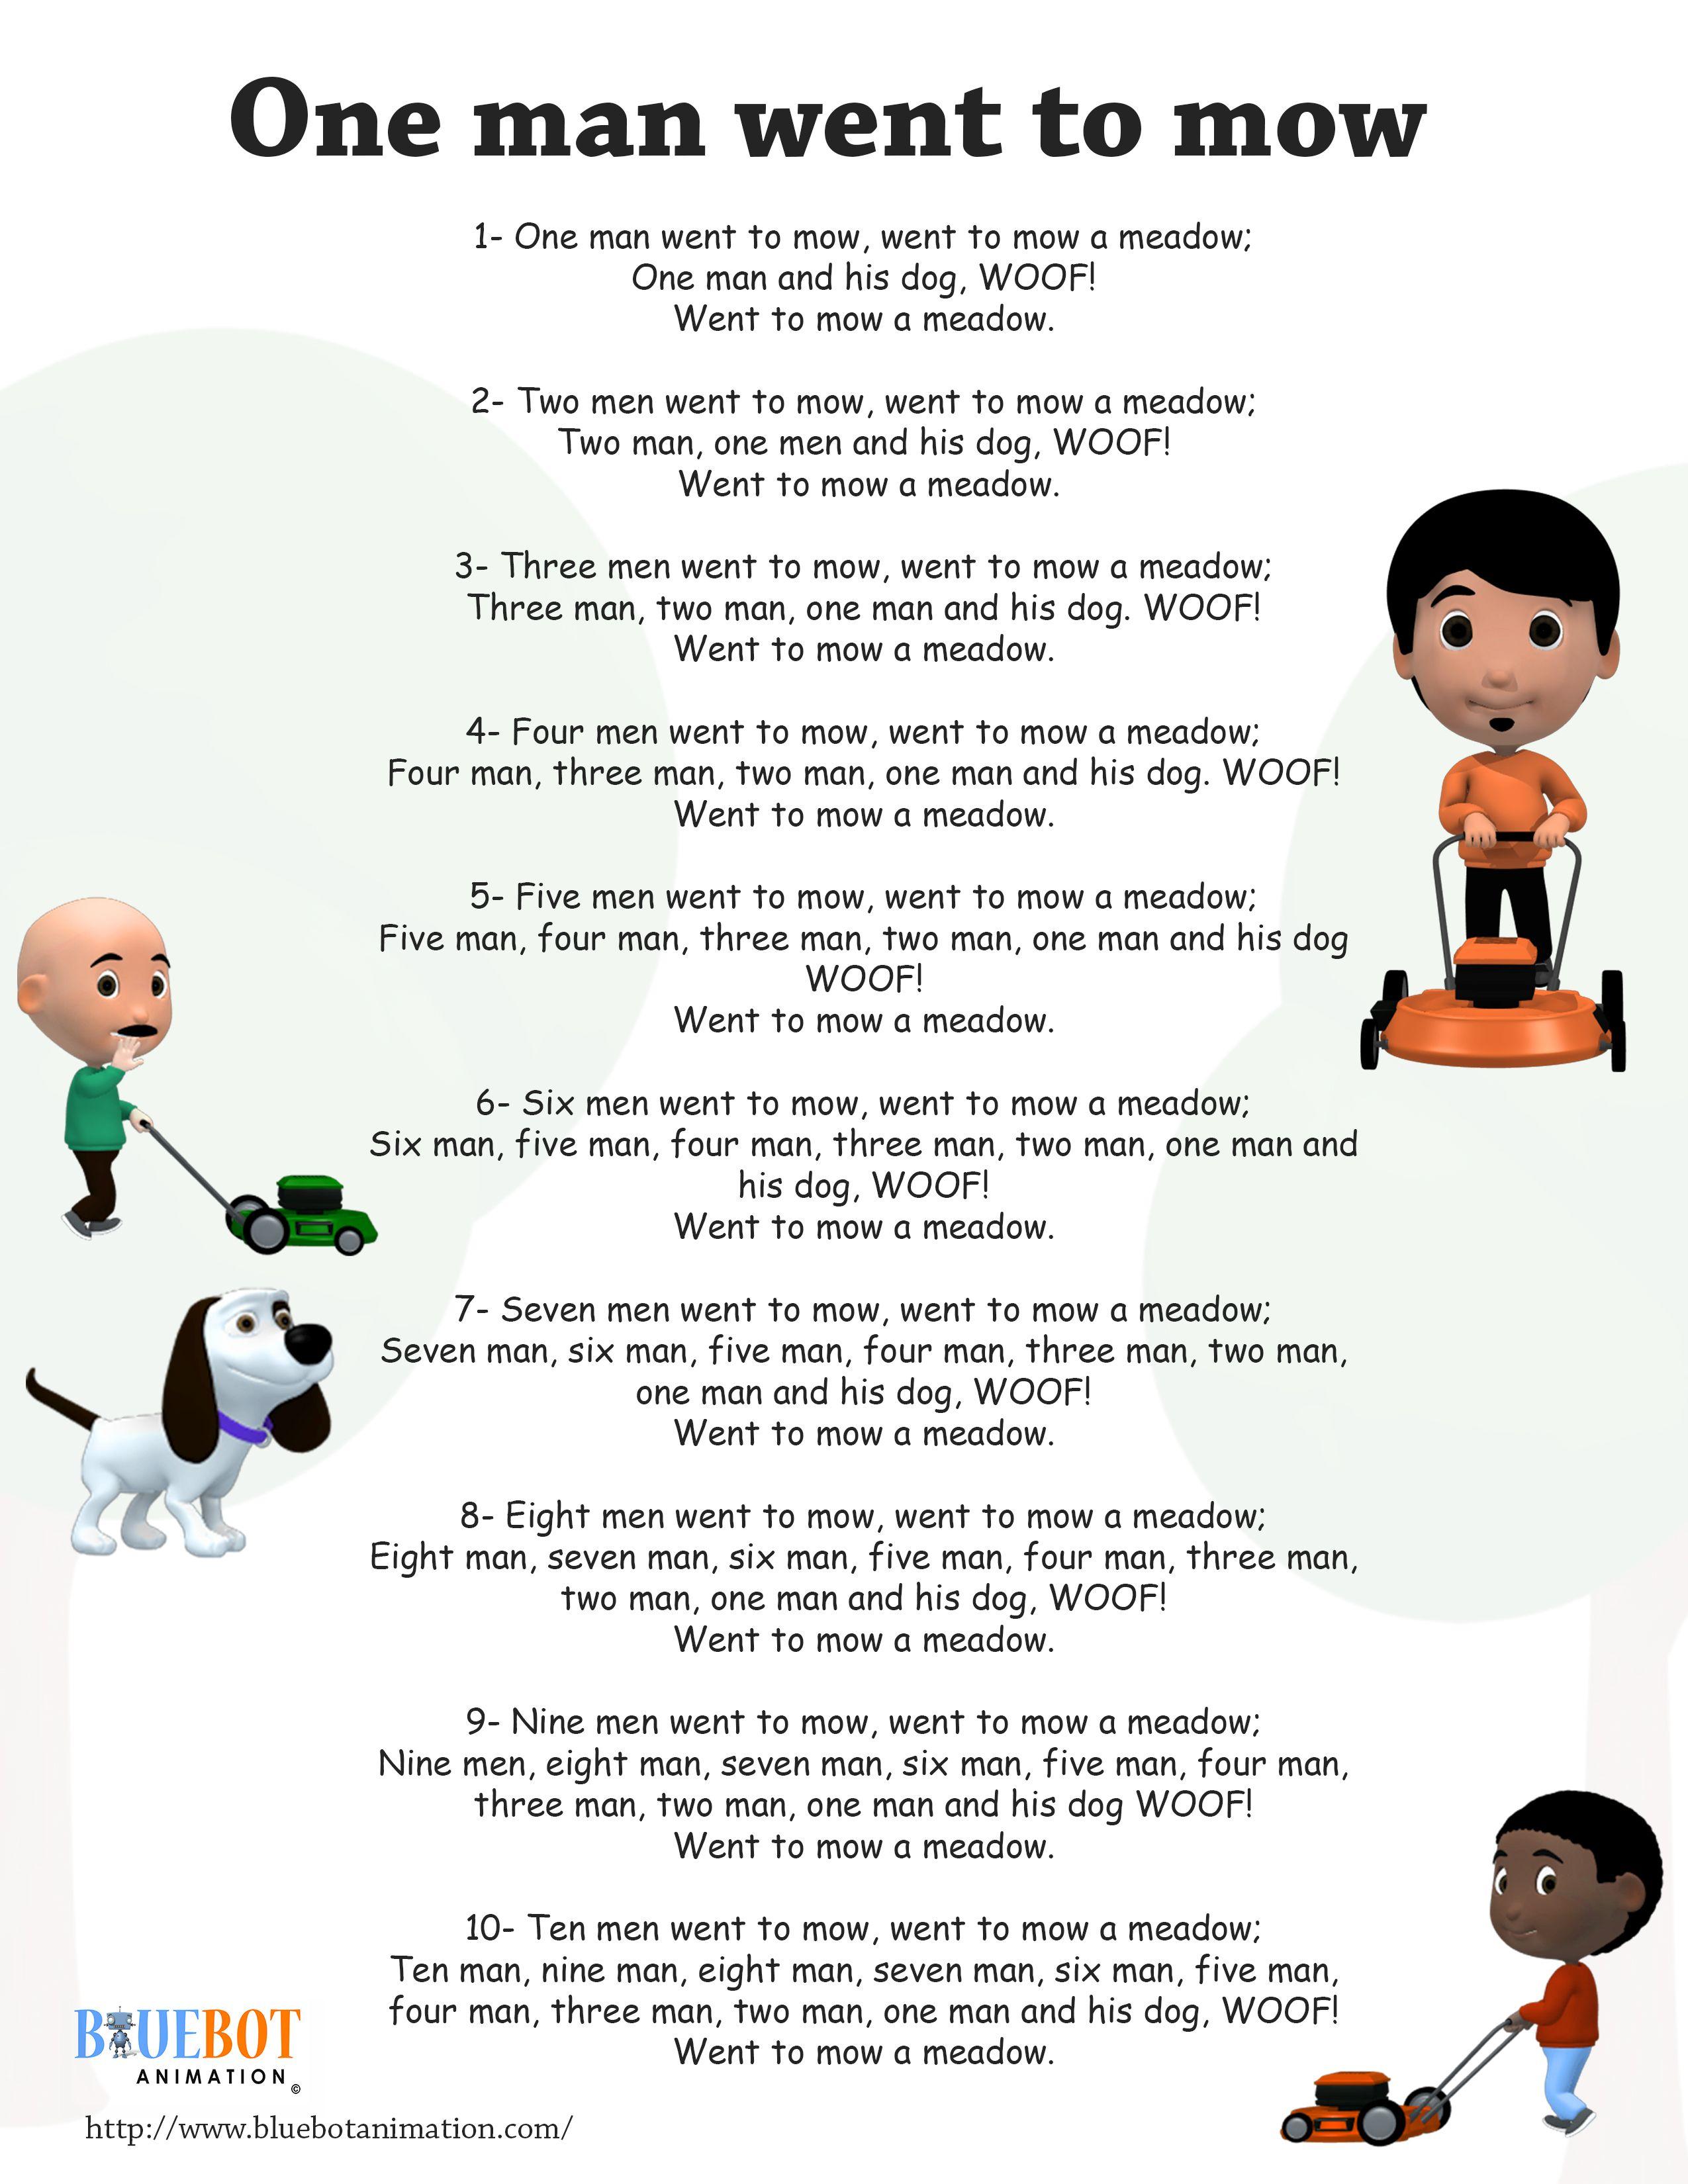 10 men went to mow nursery rhyme lyrics free printable nursery